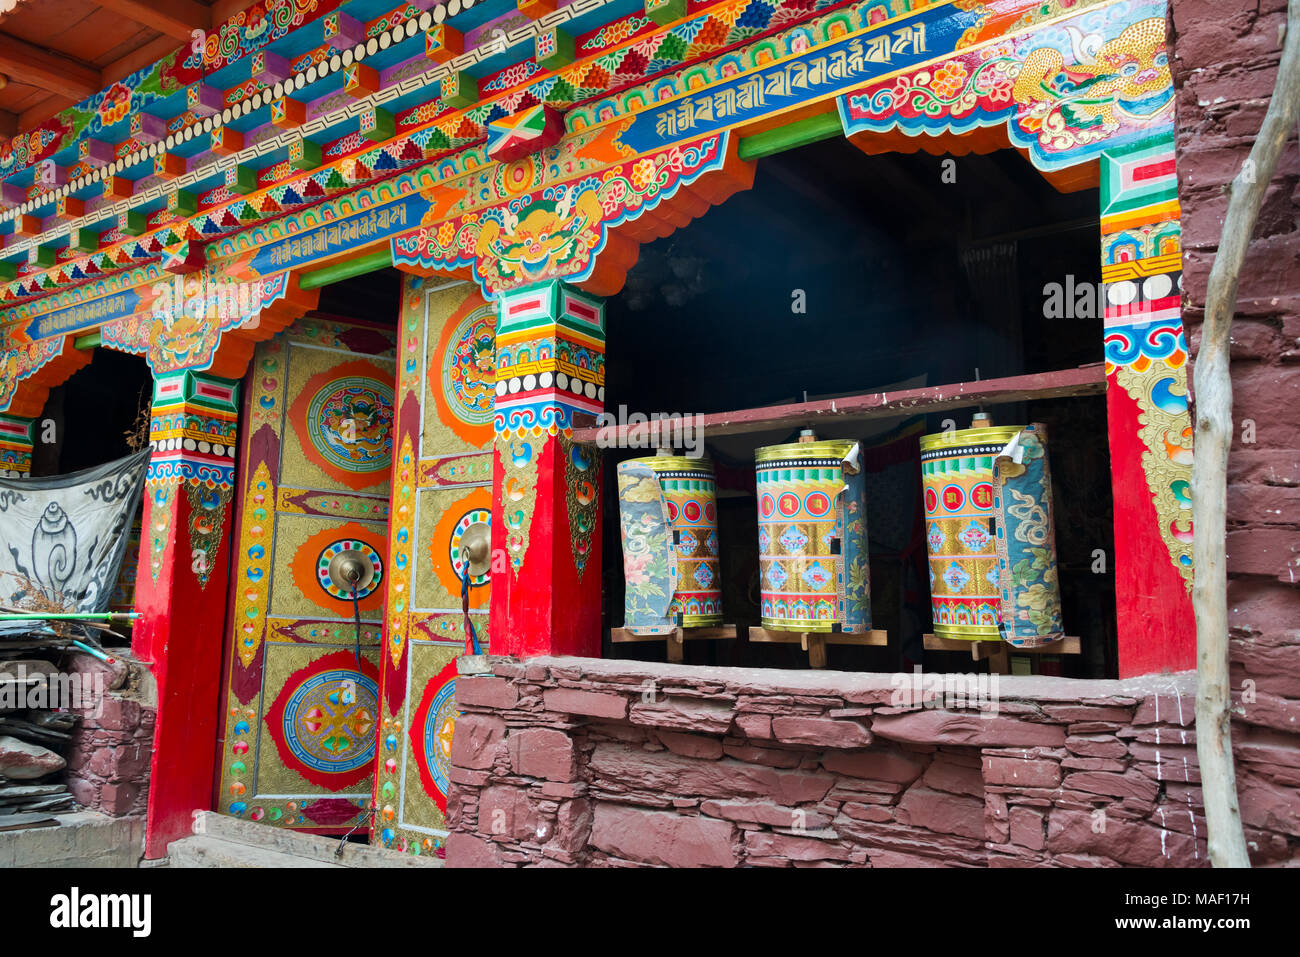 Pregando ruote in Zhuokeji Headman's Village, Ngawa tibetano e Qiang prefettura autonoma, western Sichuan, Cina Immagini Stock